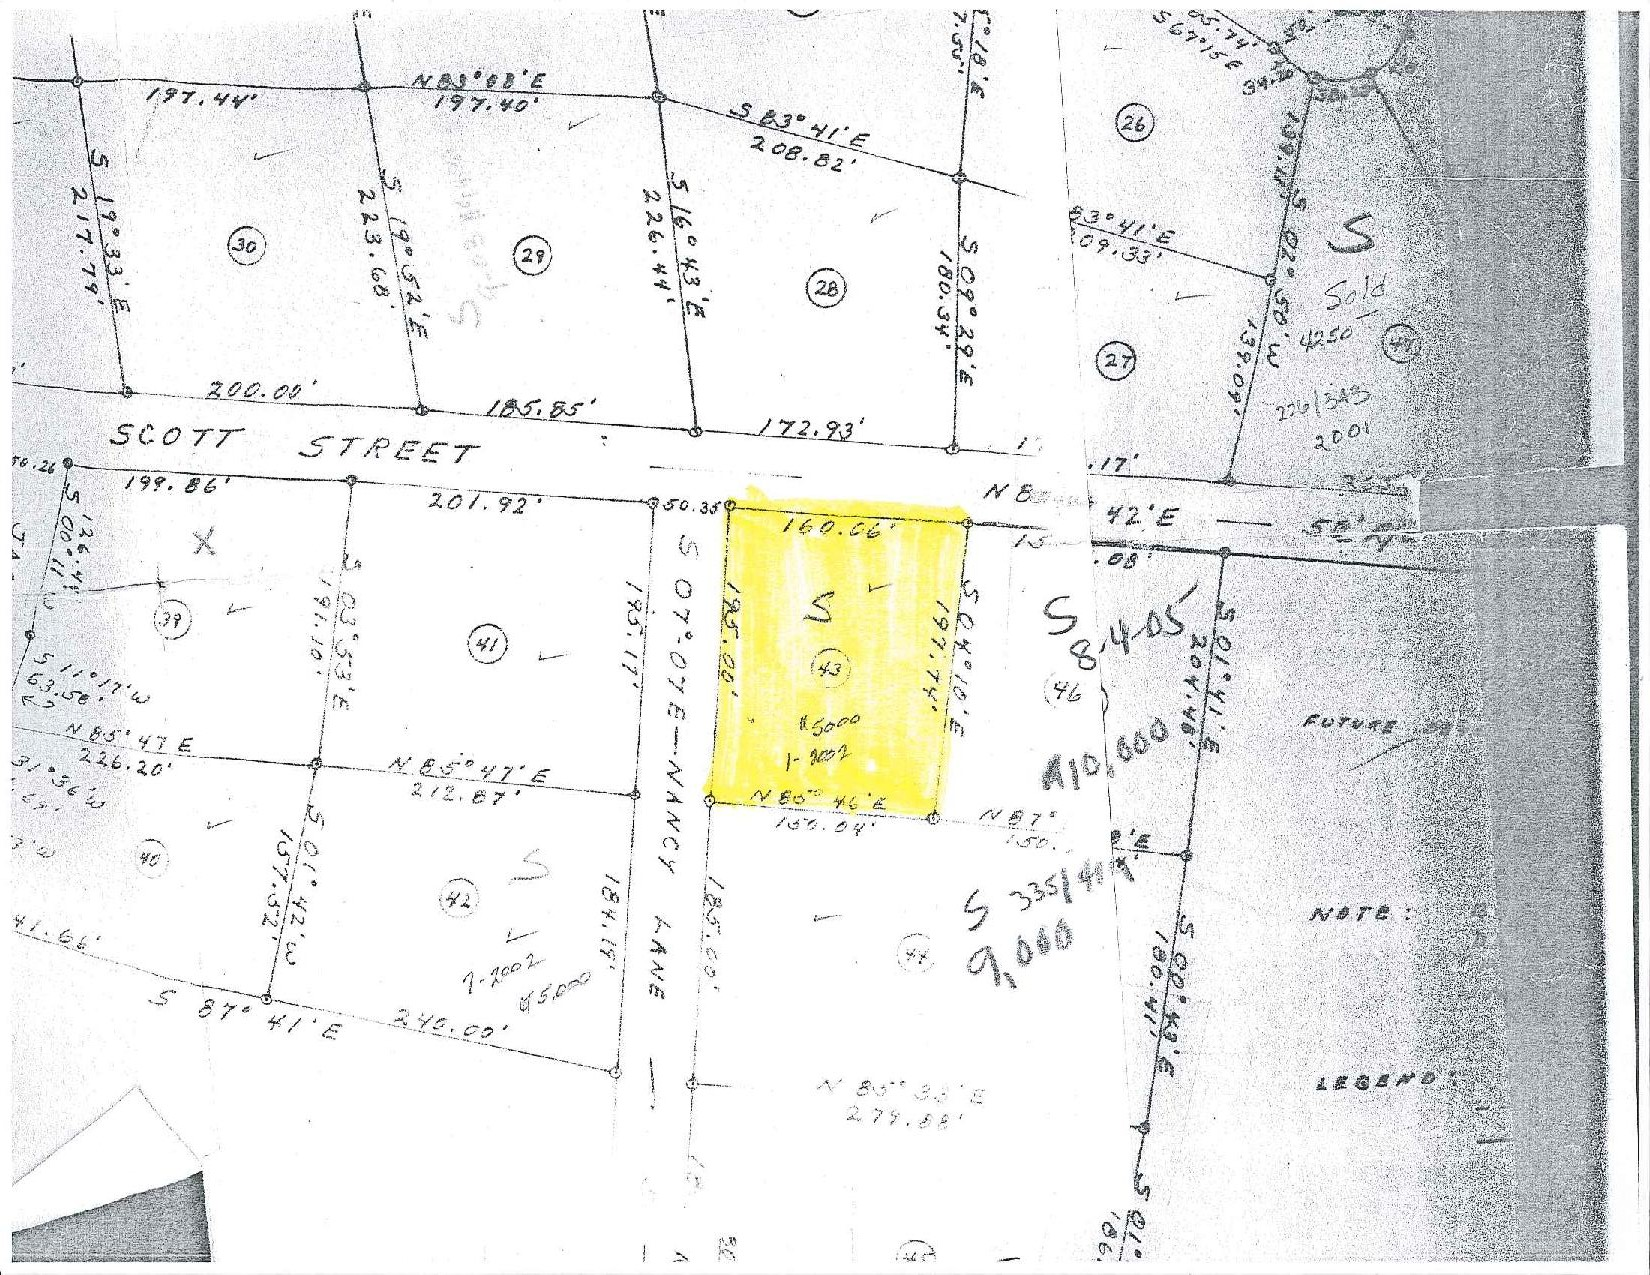 Grayson county property search